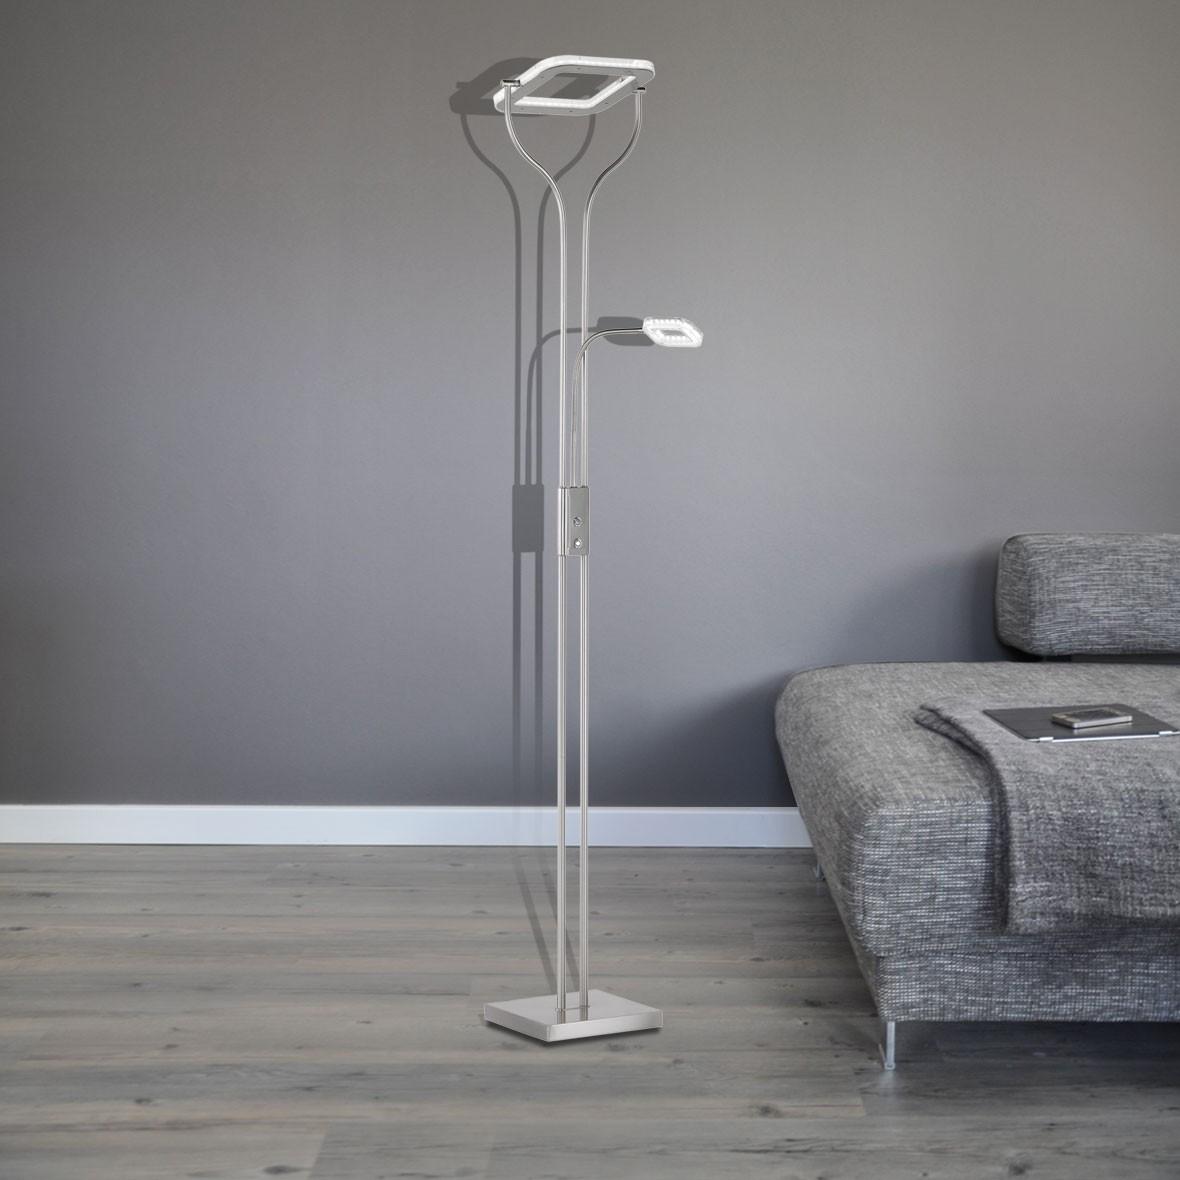 led wofi standfluter dimmbar 2 flammig jay 18w 3000k 1600lm leuchten stehleuchten. Black Bedroom Furniture Sets. Home Design Ideas